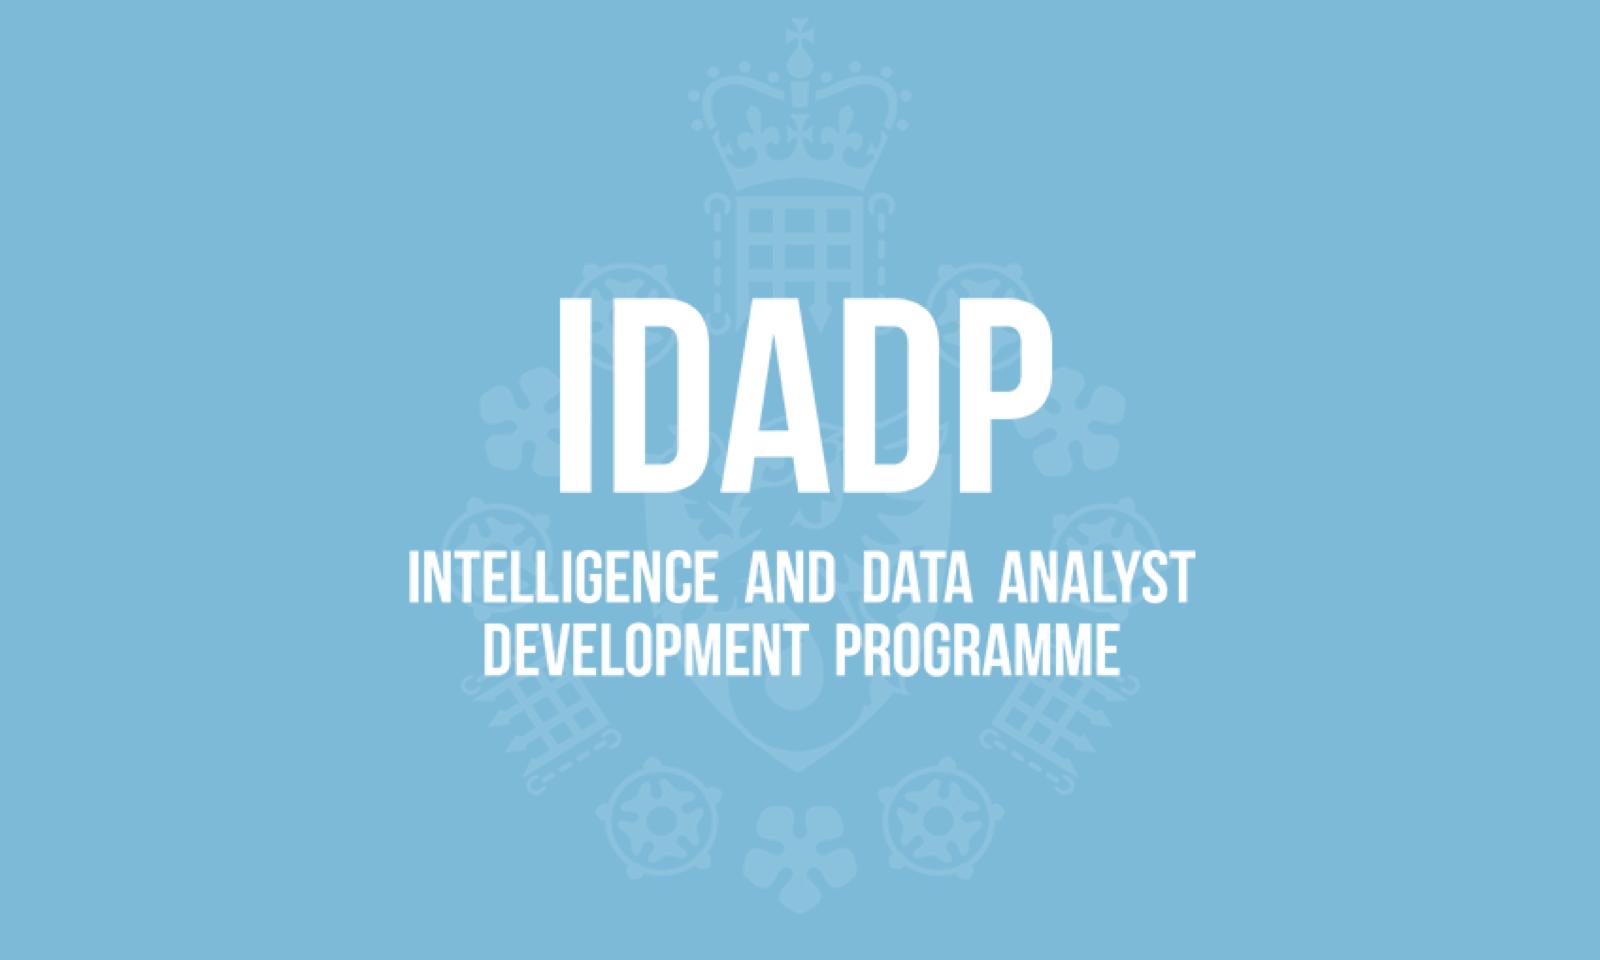 (IDADP) Intelligence and Data Analyst Programme